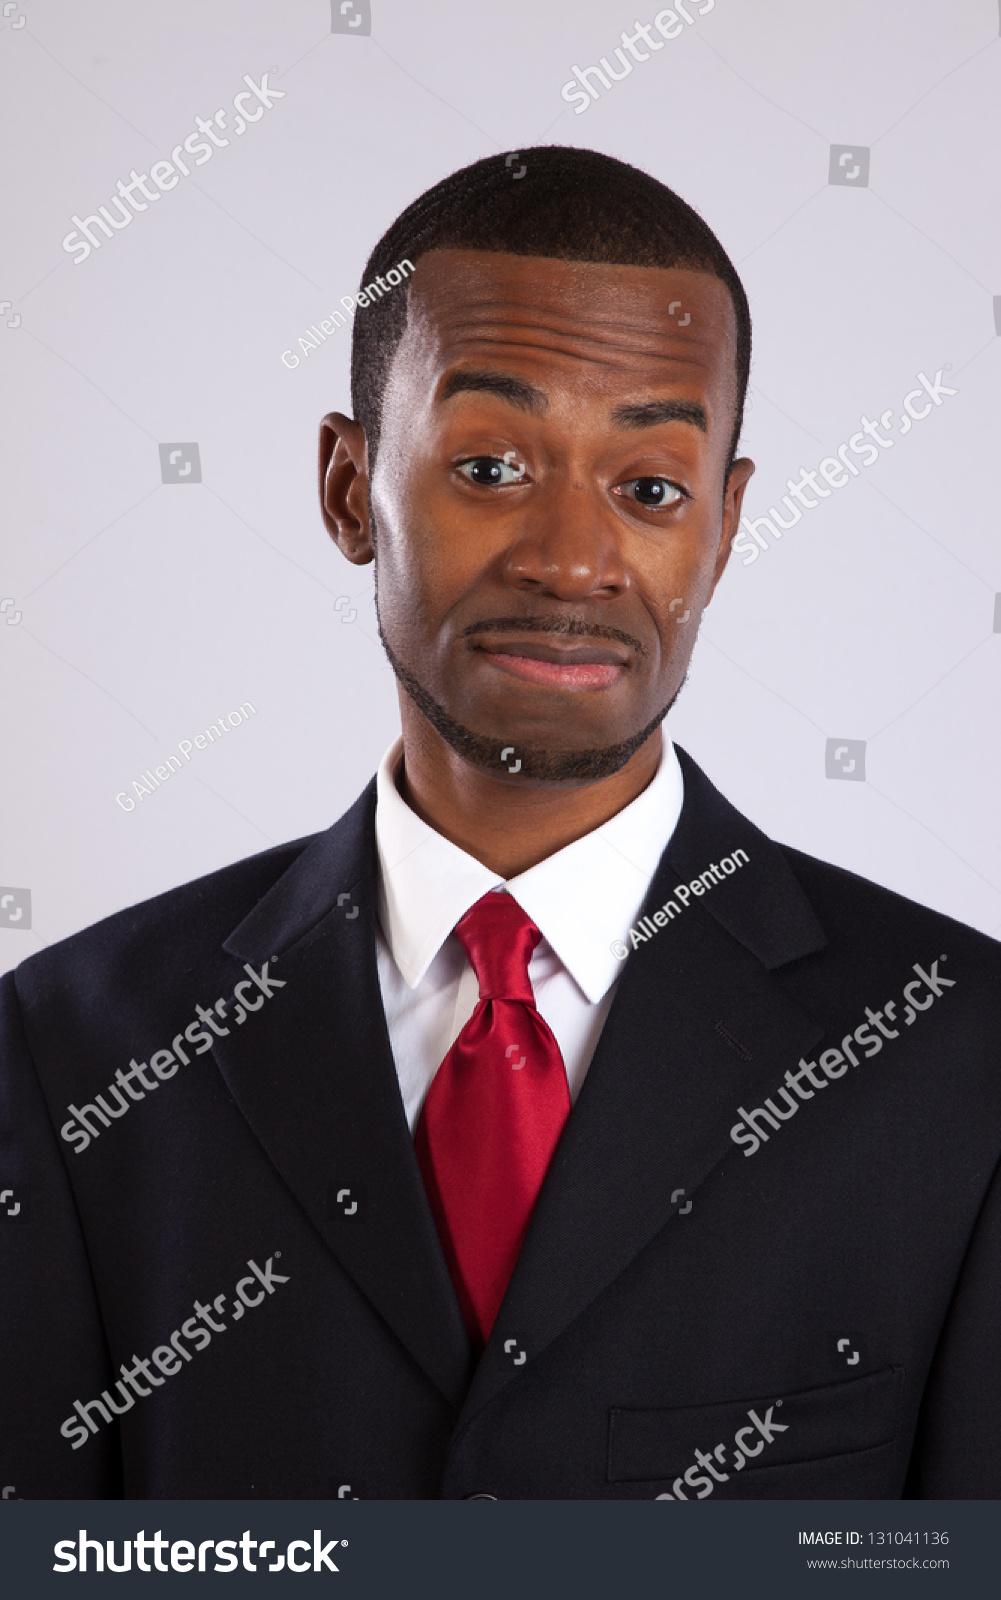 Handsome Black Businessman Suit Red Tie Stock Photo Edit Now